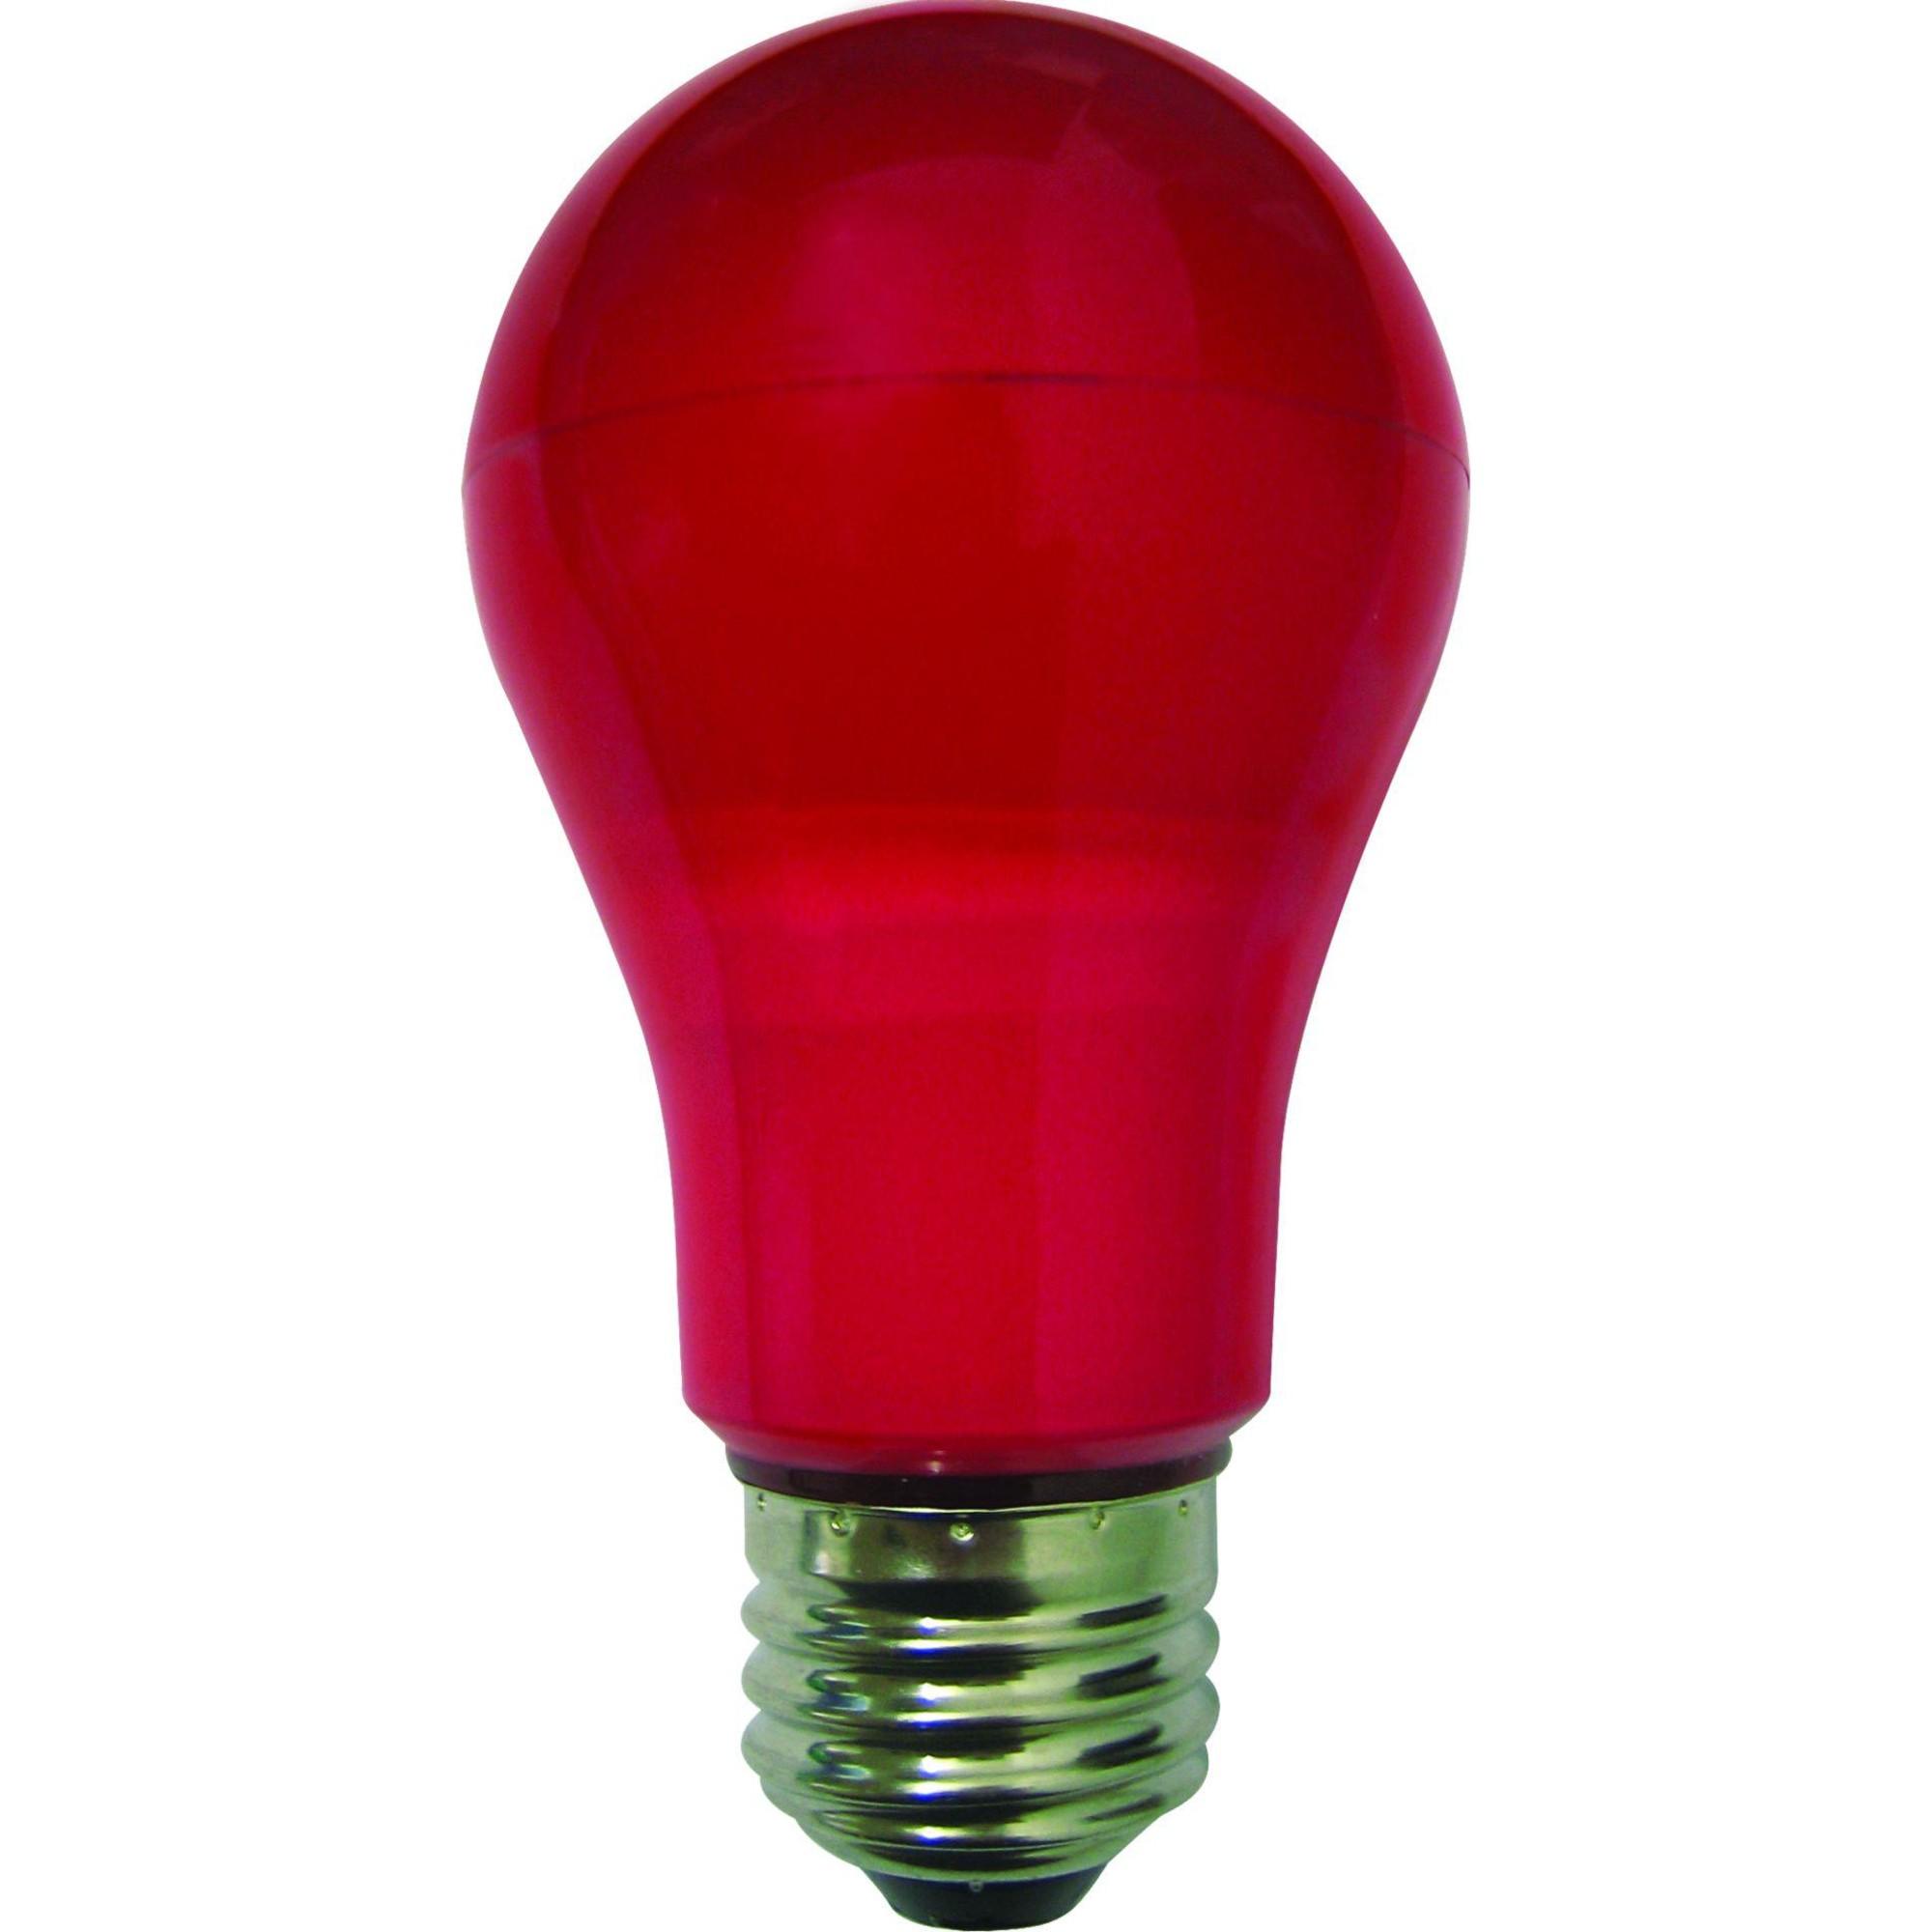 Лампа Ecola стандарт светодионая E27 8 Вт груша Лм теплый свет